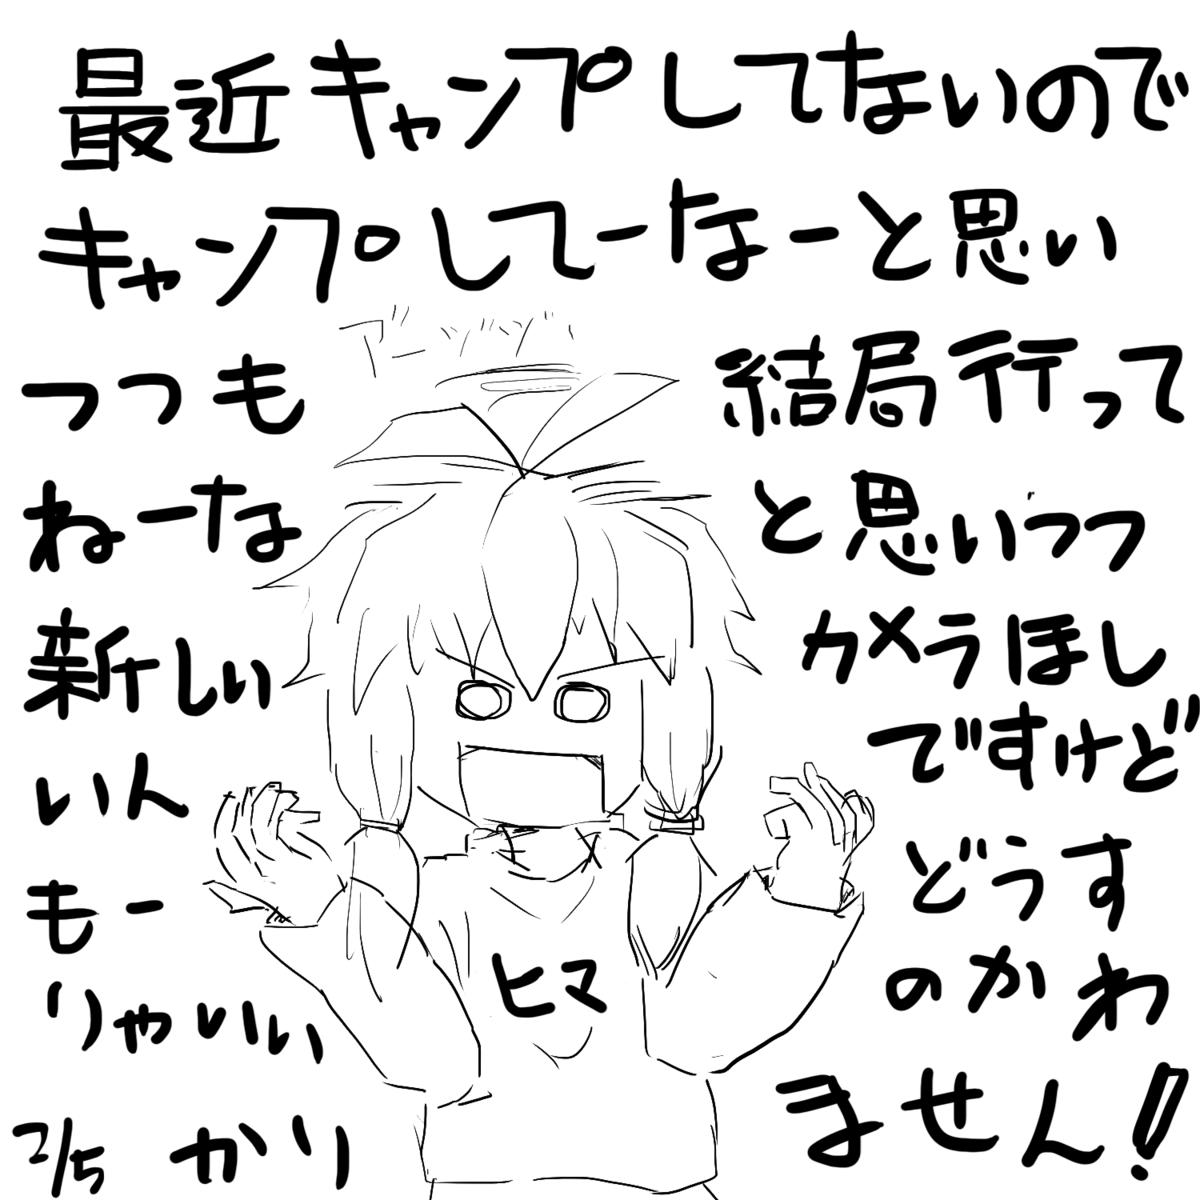 f:id:zomuzomu:20210205122101p:plain